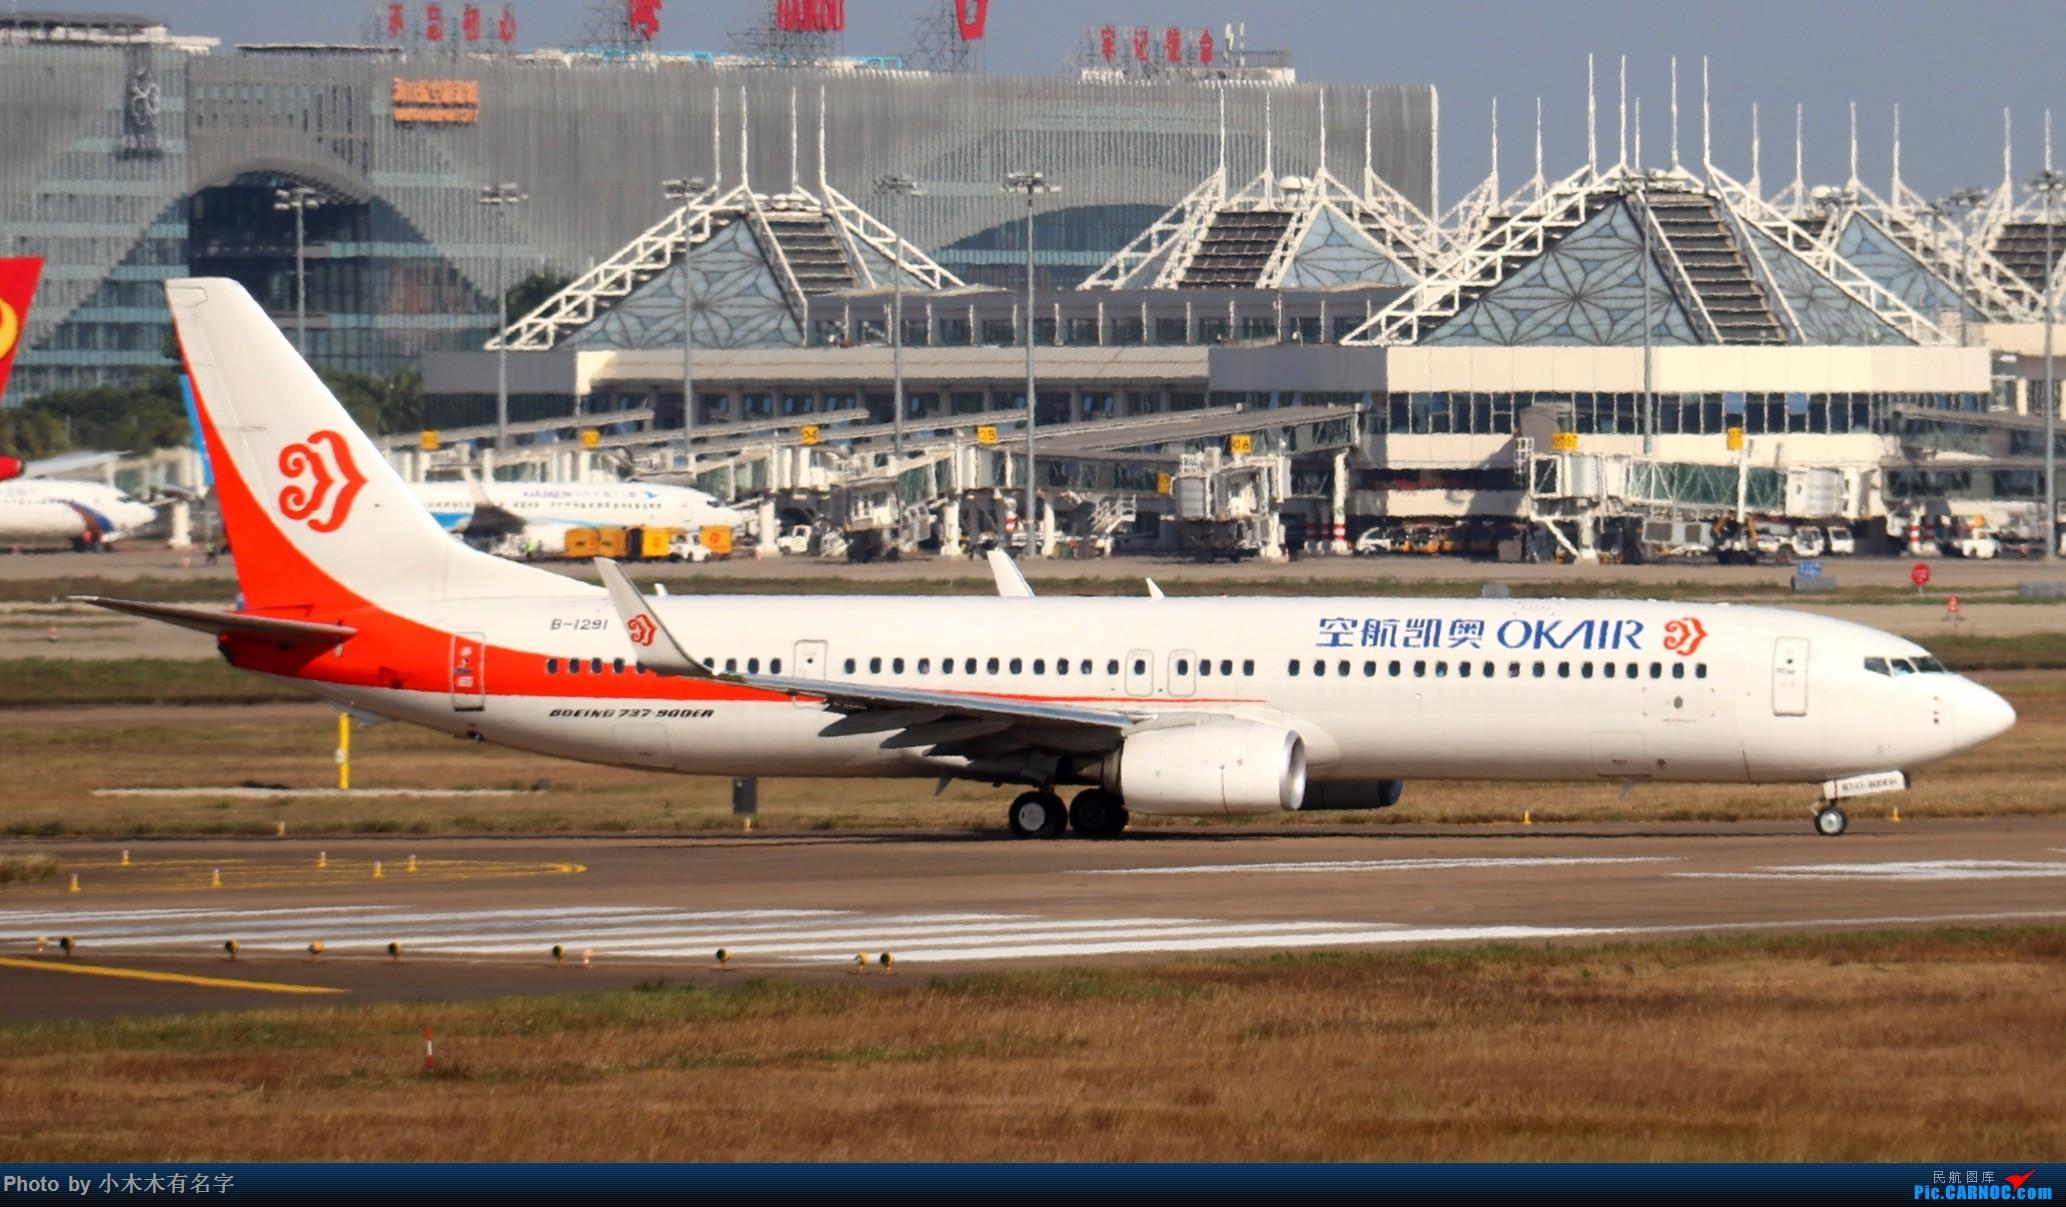 Re:[原创]2019冬天的海口美兰 BOEING 737-900ER B-1291 中国海口美兰国际机场